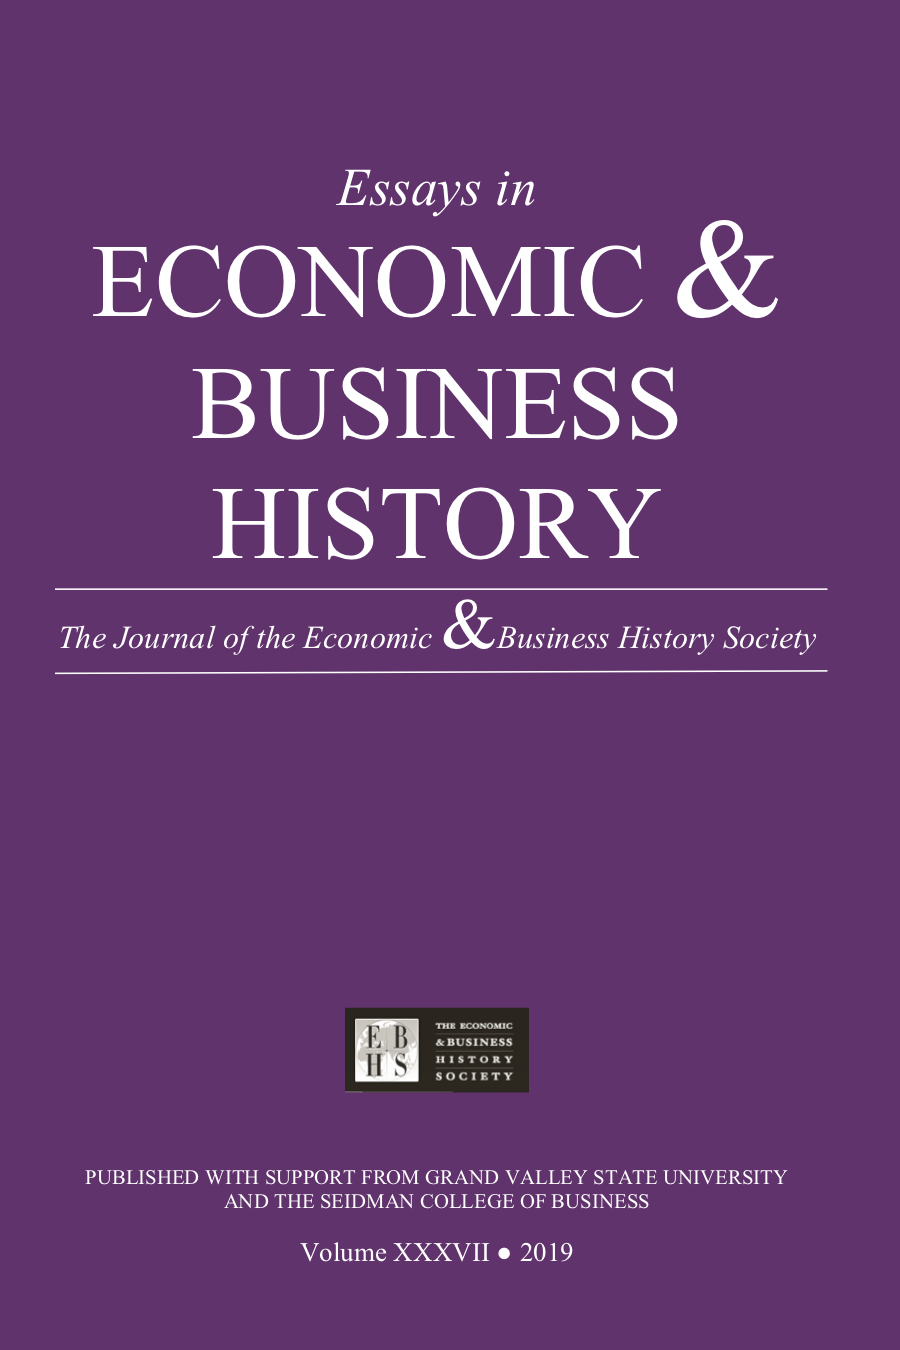 Essays in Economic & Business History 2019